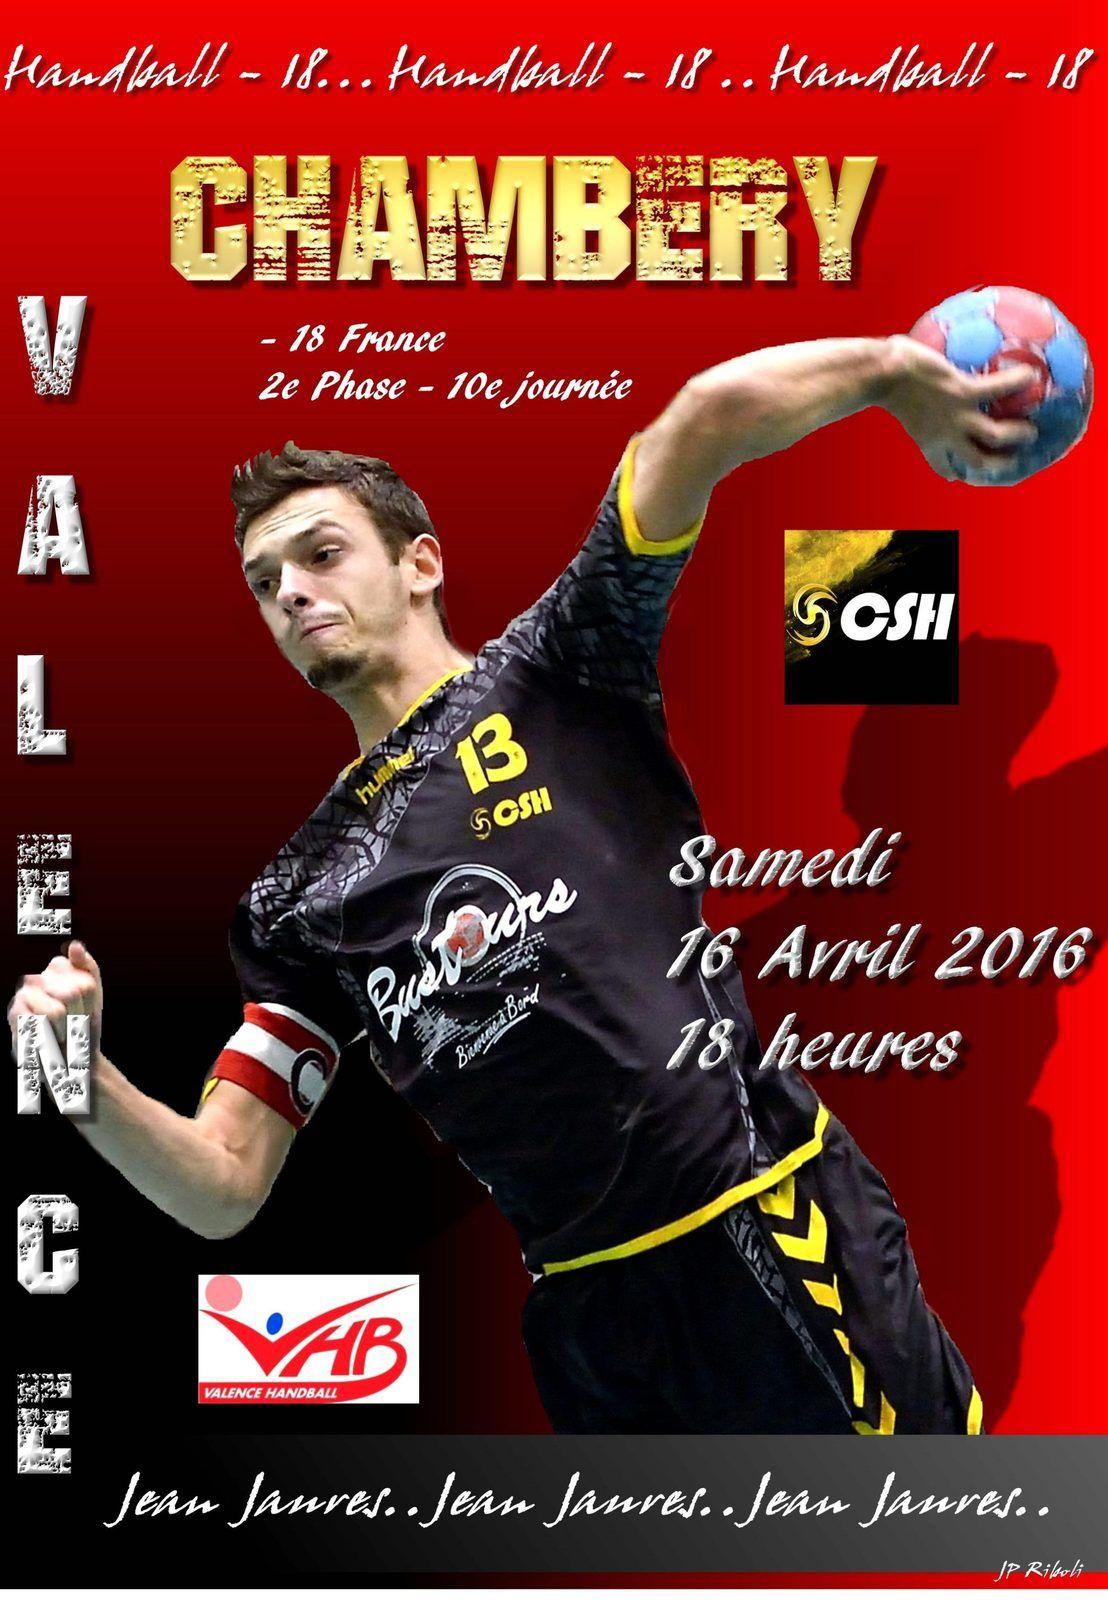 CSH les - 18 France recoivent Valence ce samedi 16